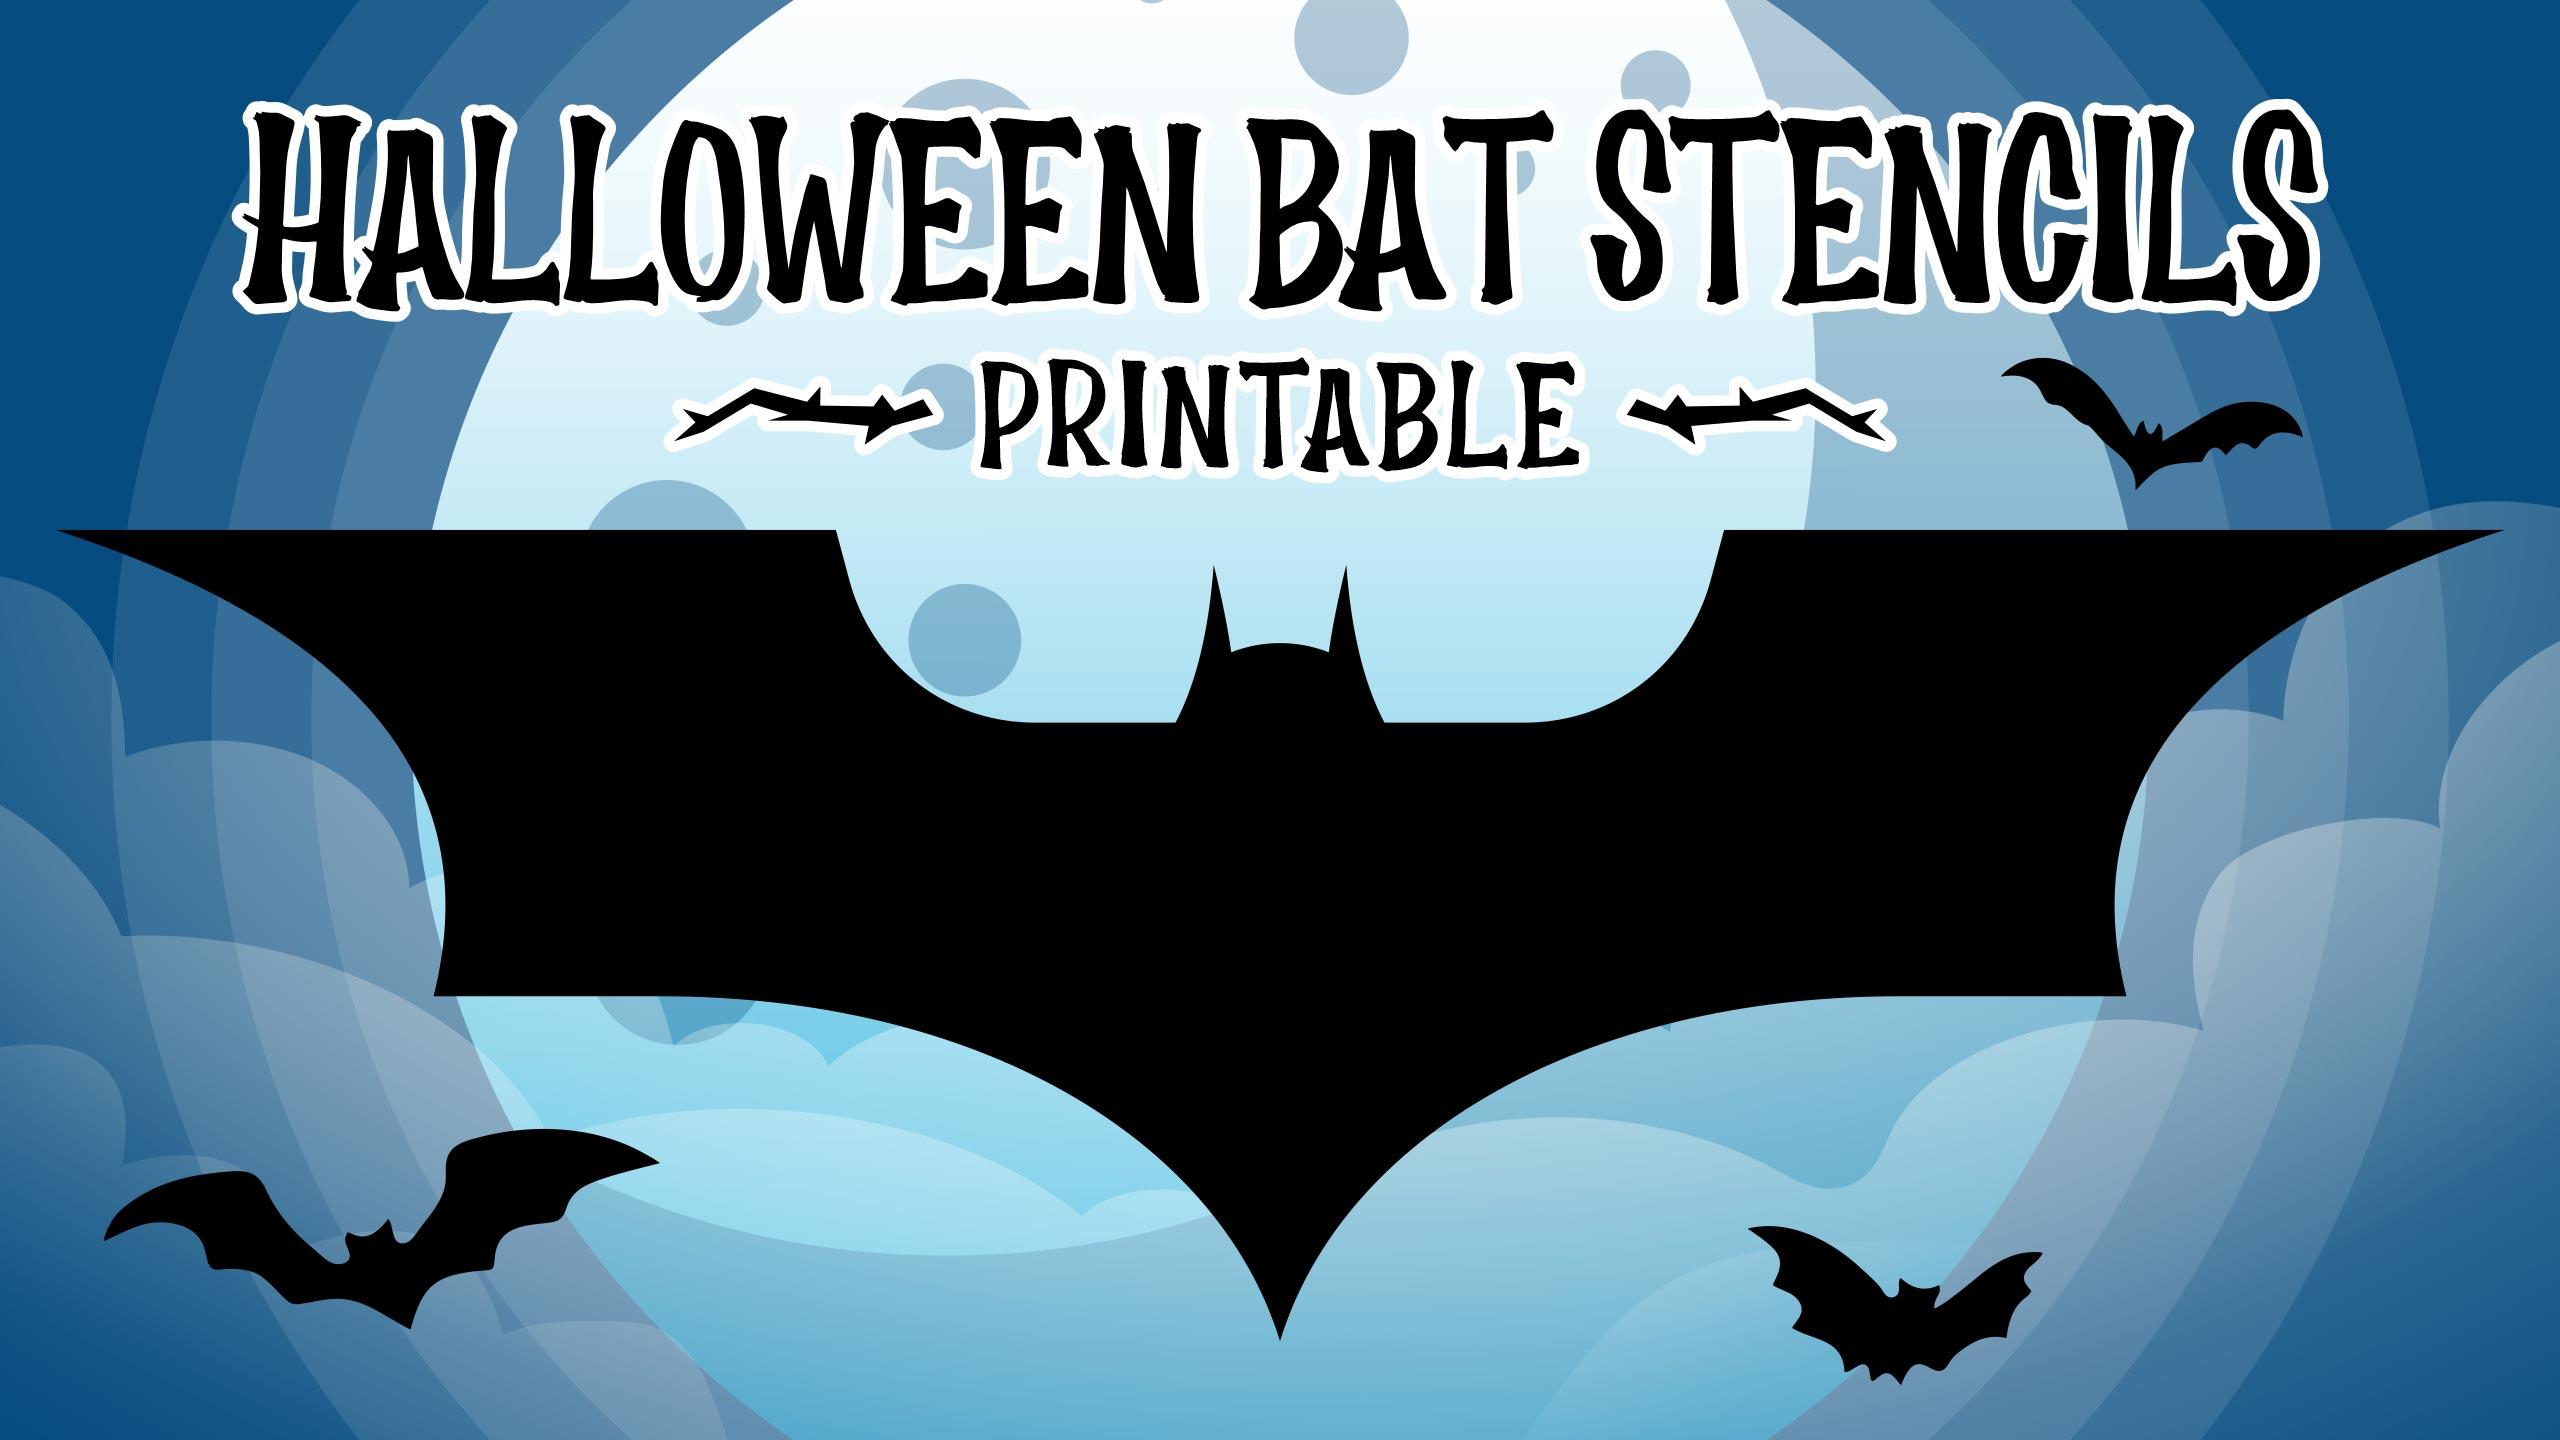 Halloween Bat Stencils Printable